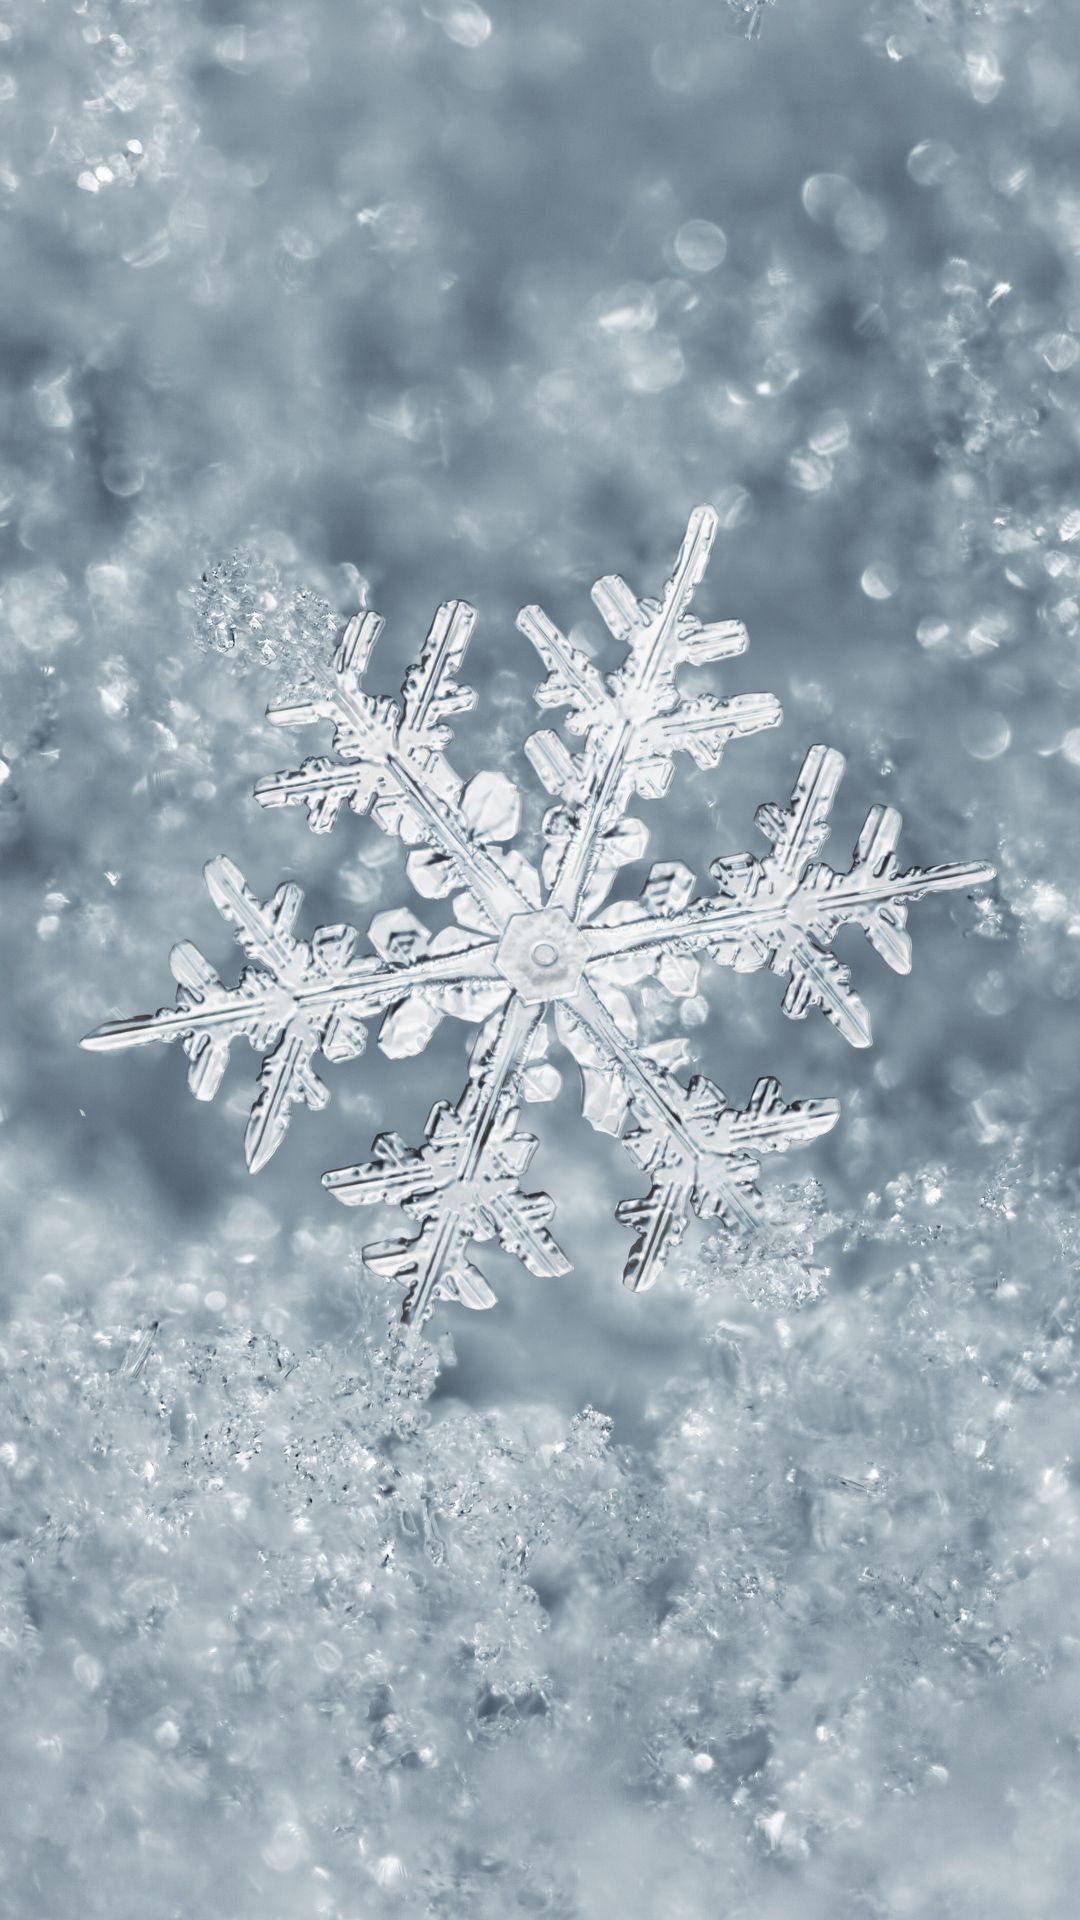 Res: 1080x1920, Ice Snowflake iPhone 7 Plus Wallpaper